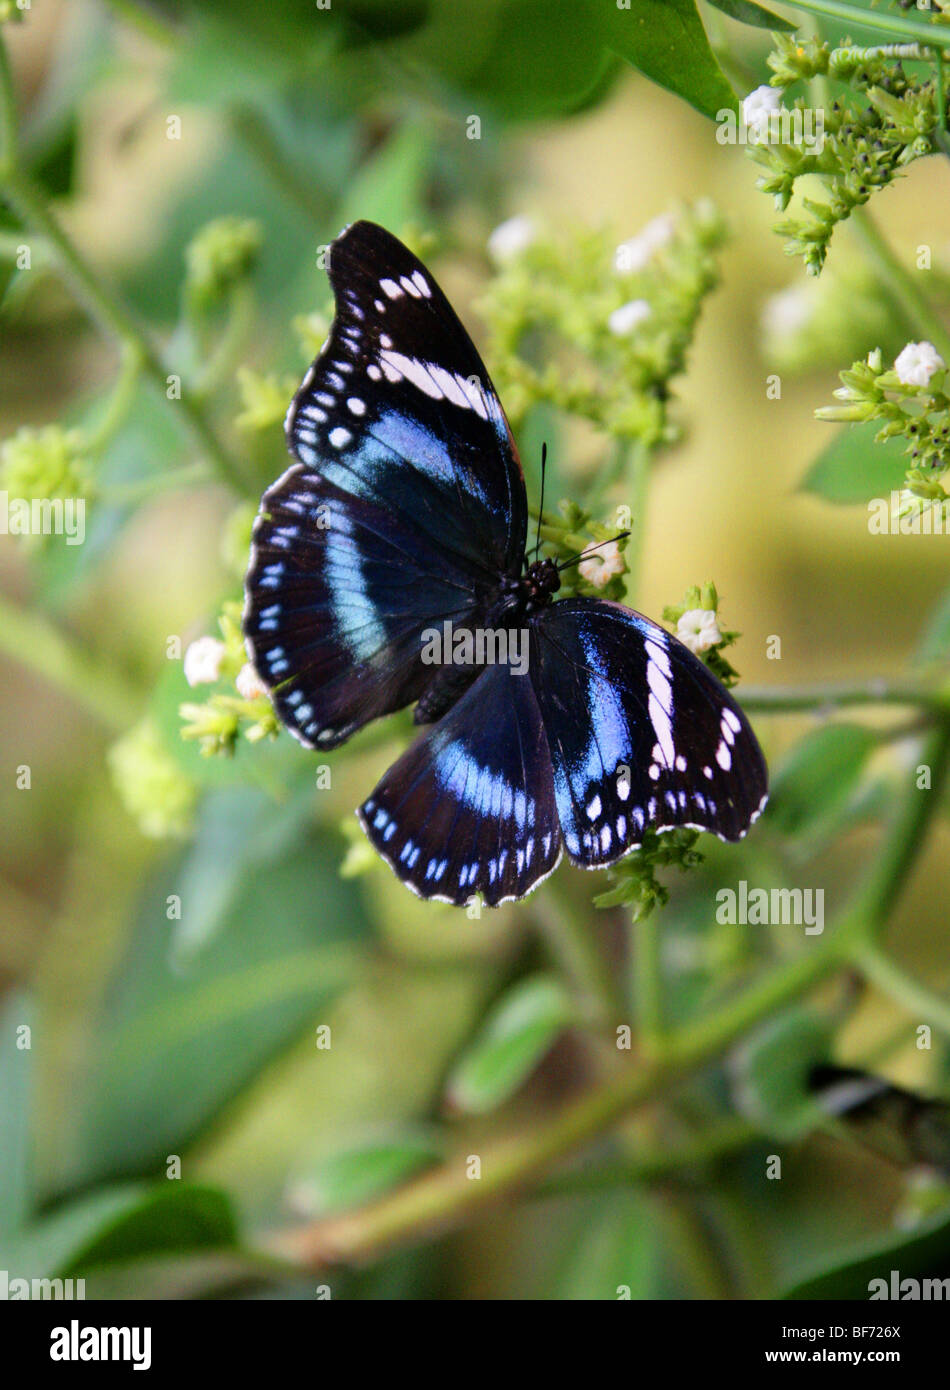 Amani Eggfly or Tanzanian Diadem Butterfly, Hypolimnas antevorta, Nymphalidae, Tanzania, Africa - Stock Image